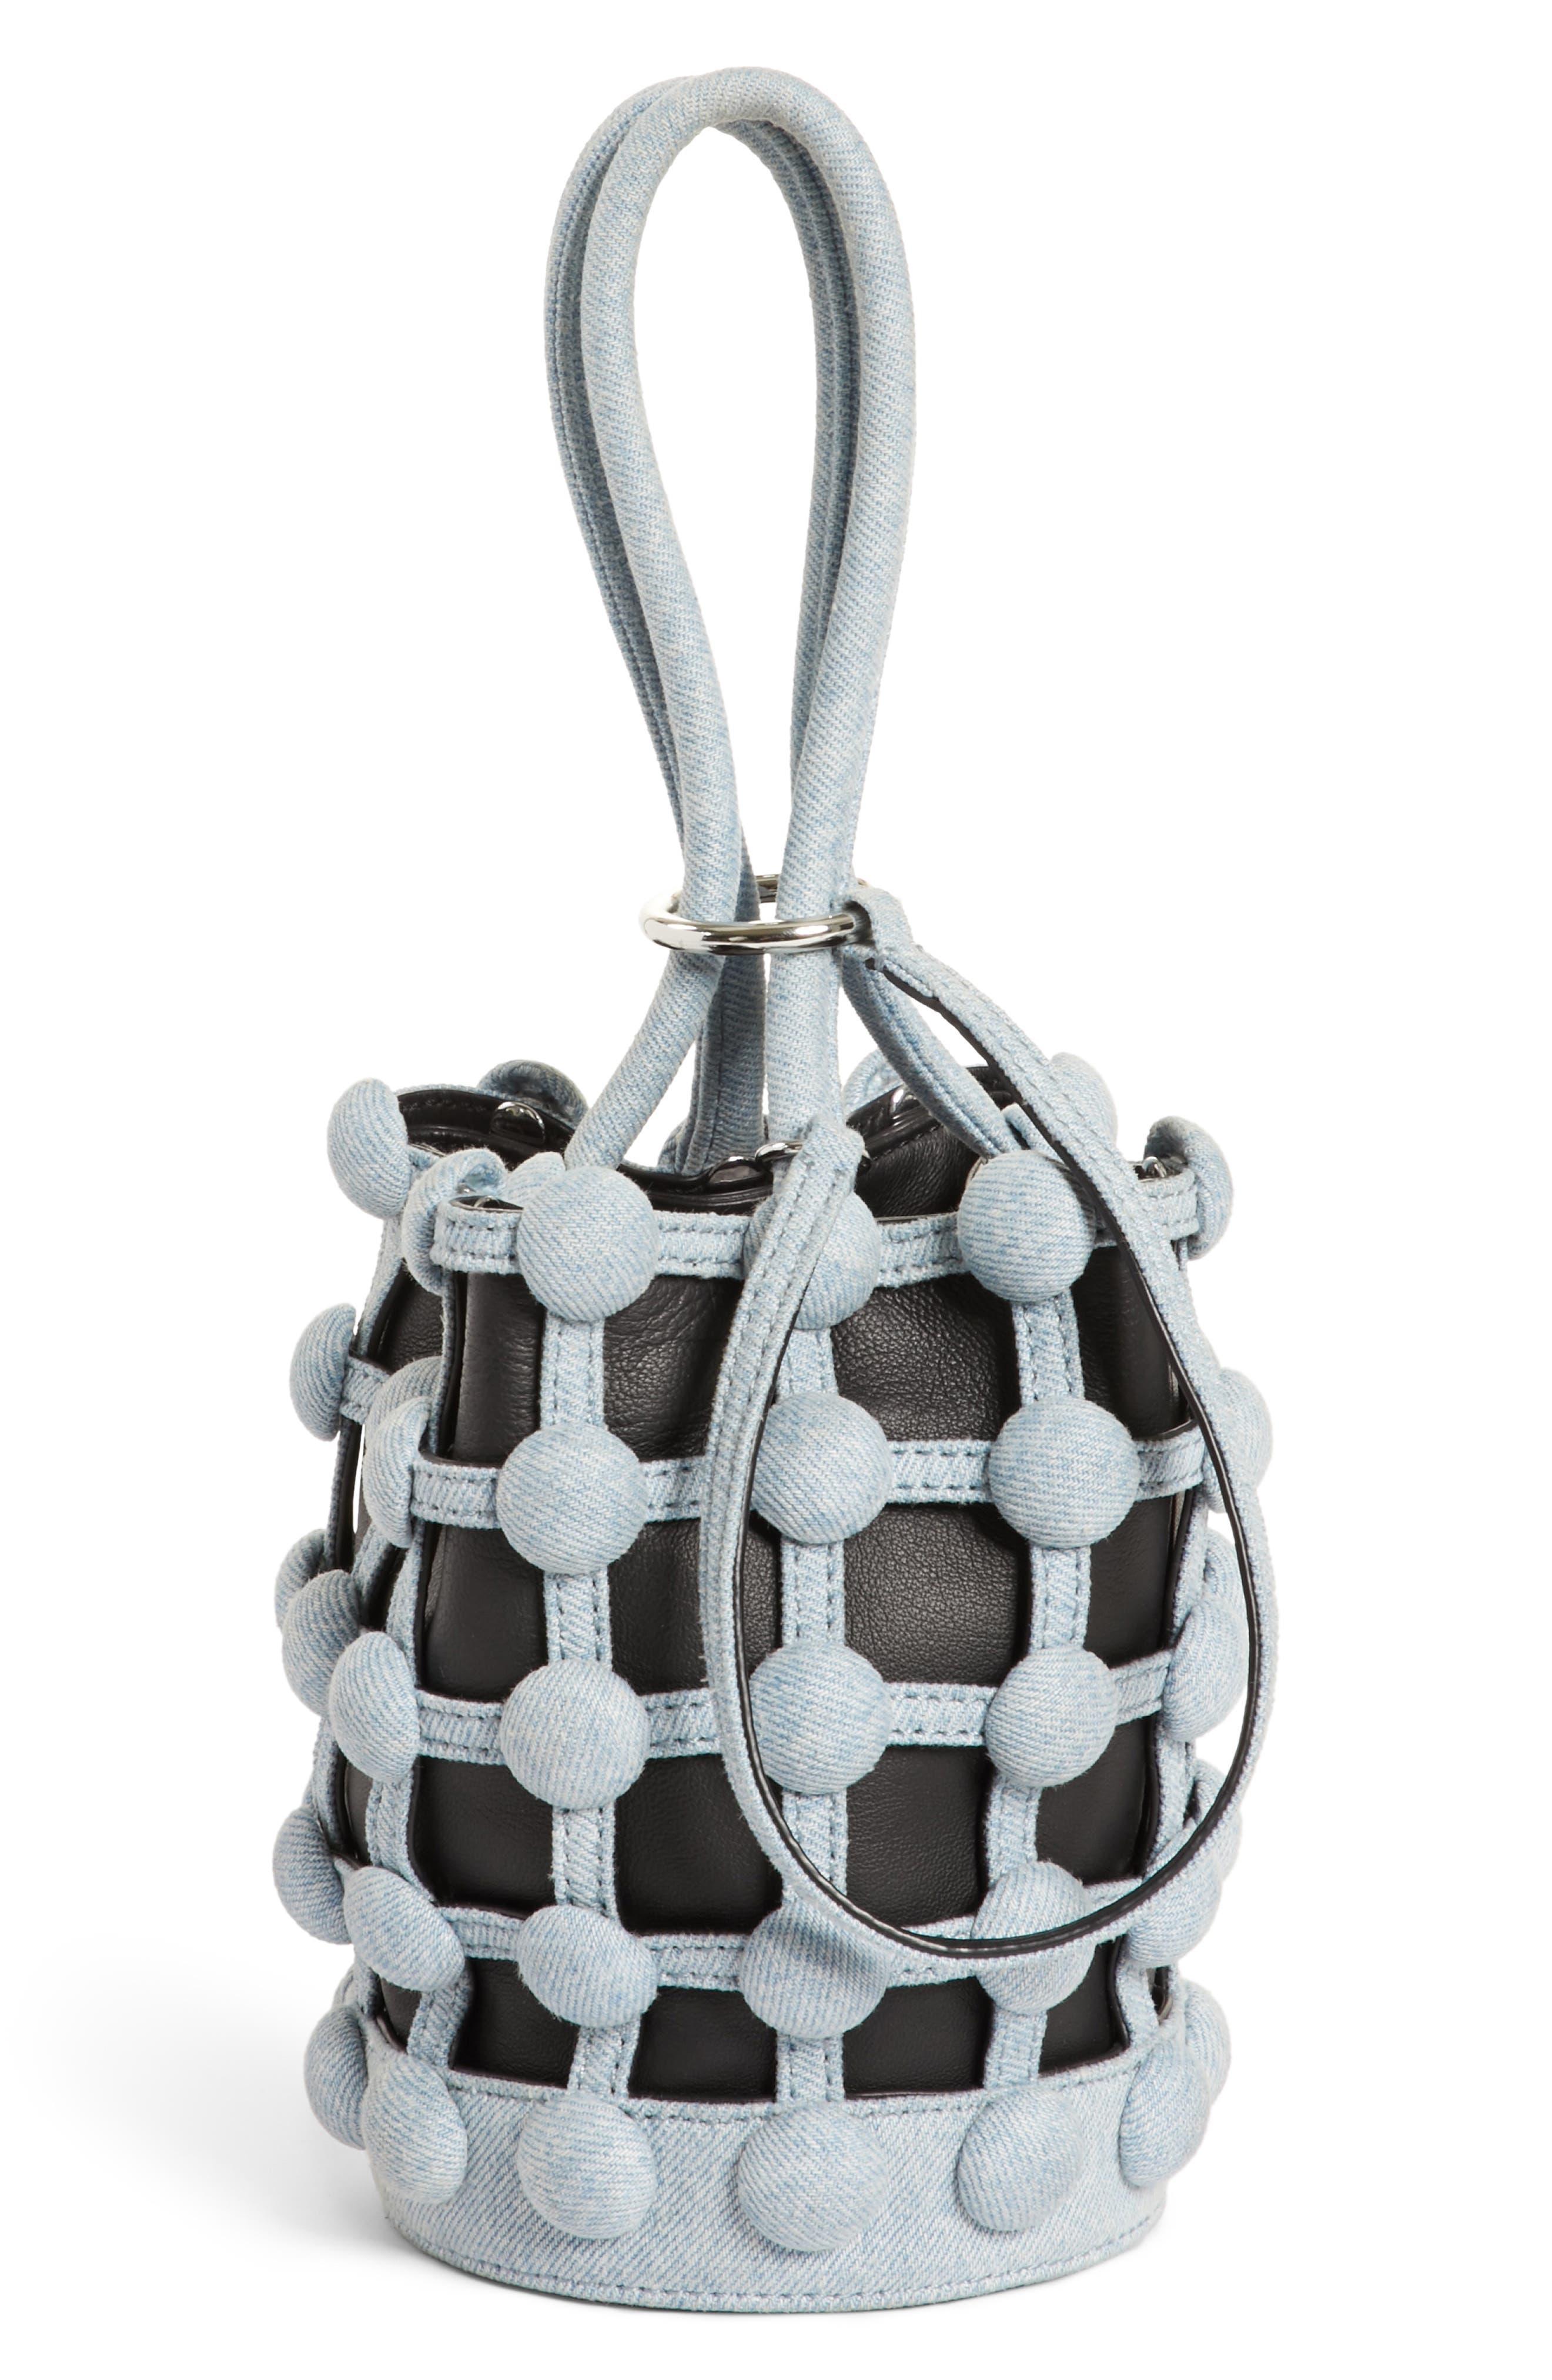 Main Image - Alexander Wang Mini Roxy Denim Cage Leather Bucket Bag